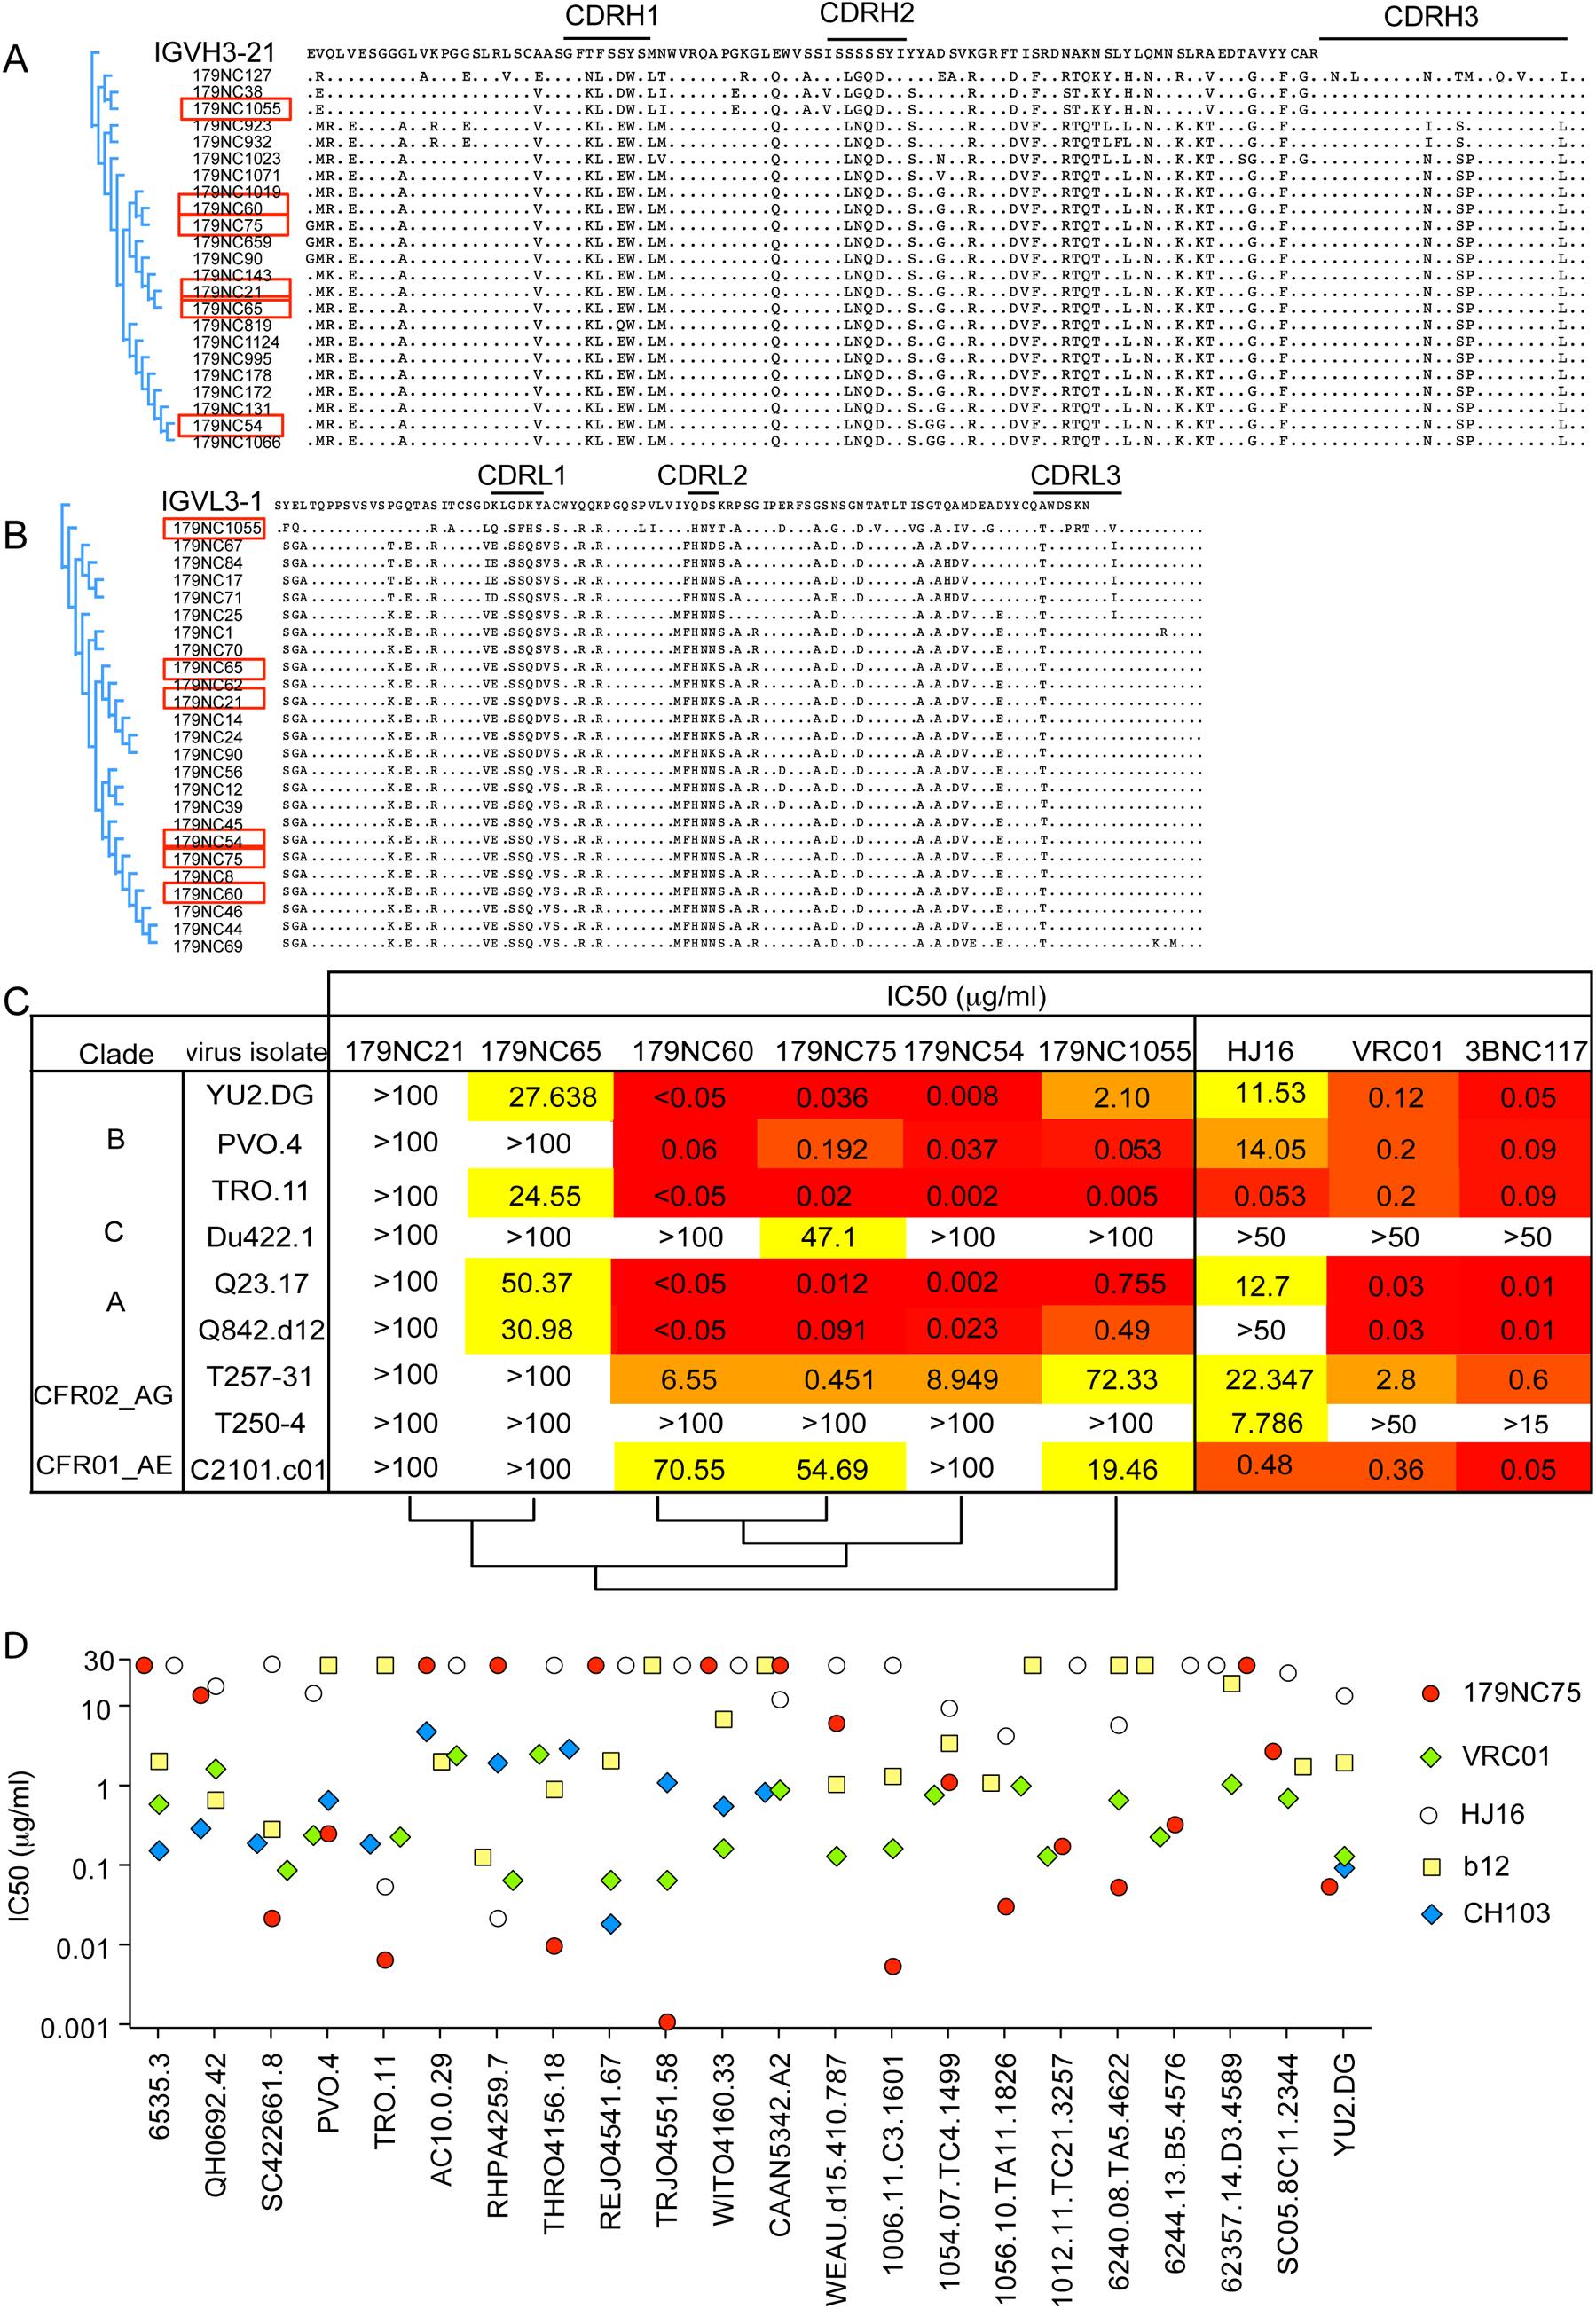 179NC75 clonal family variants.